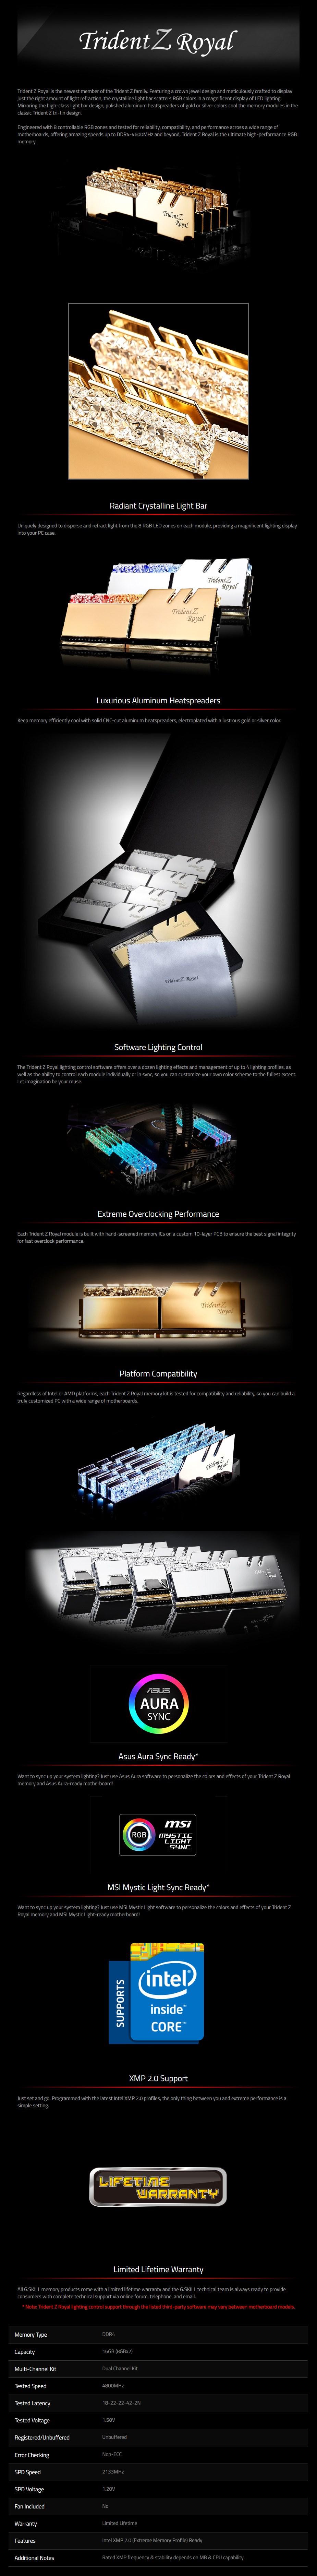 G.SKill Trident Z RGB Royal 16GB (2x 8GB) DDR4 CL18 4800MHz Memory - Silver - Desktop Overview 1